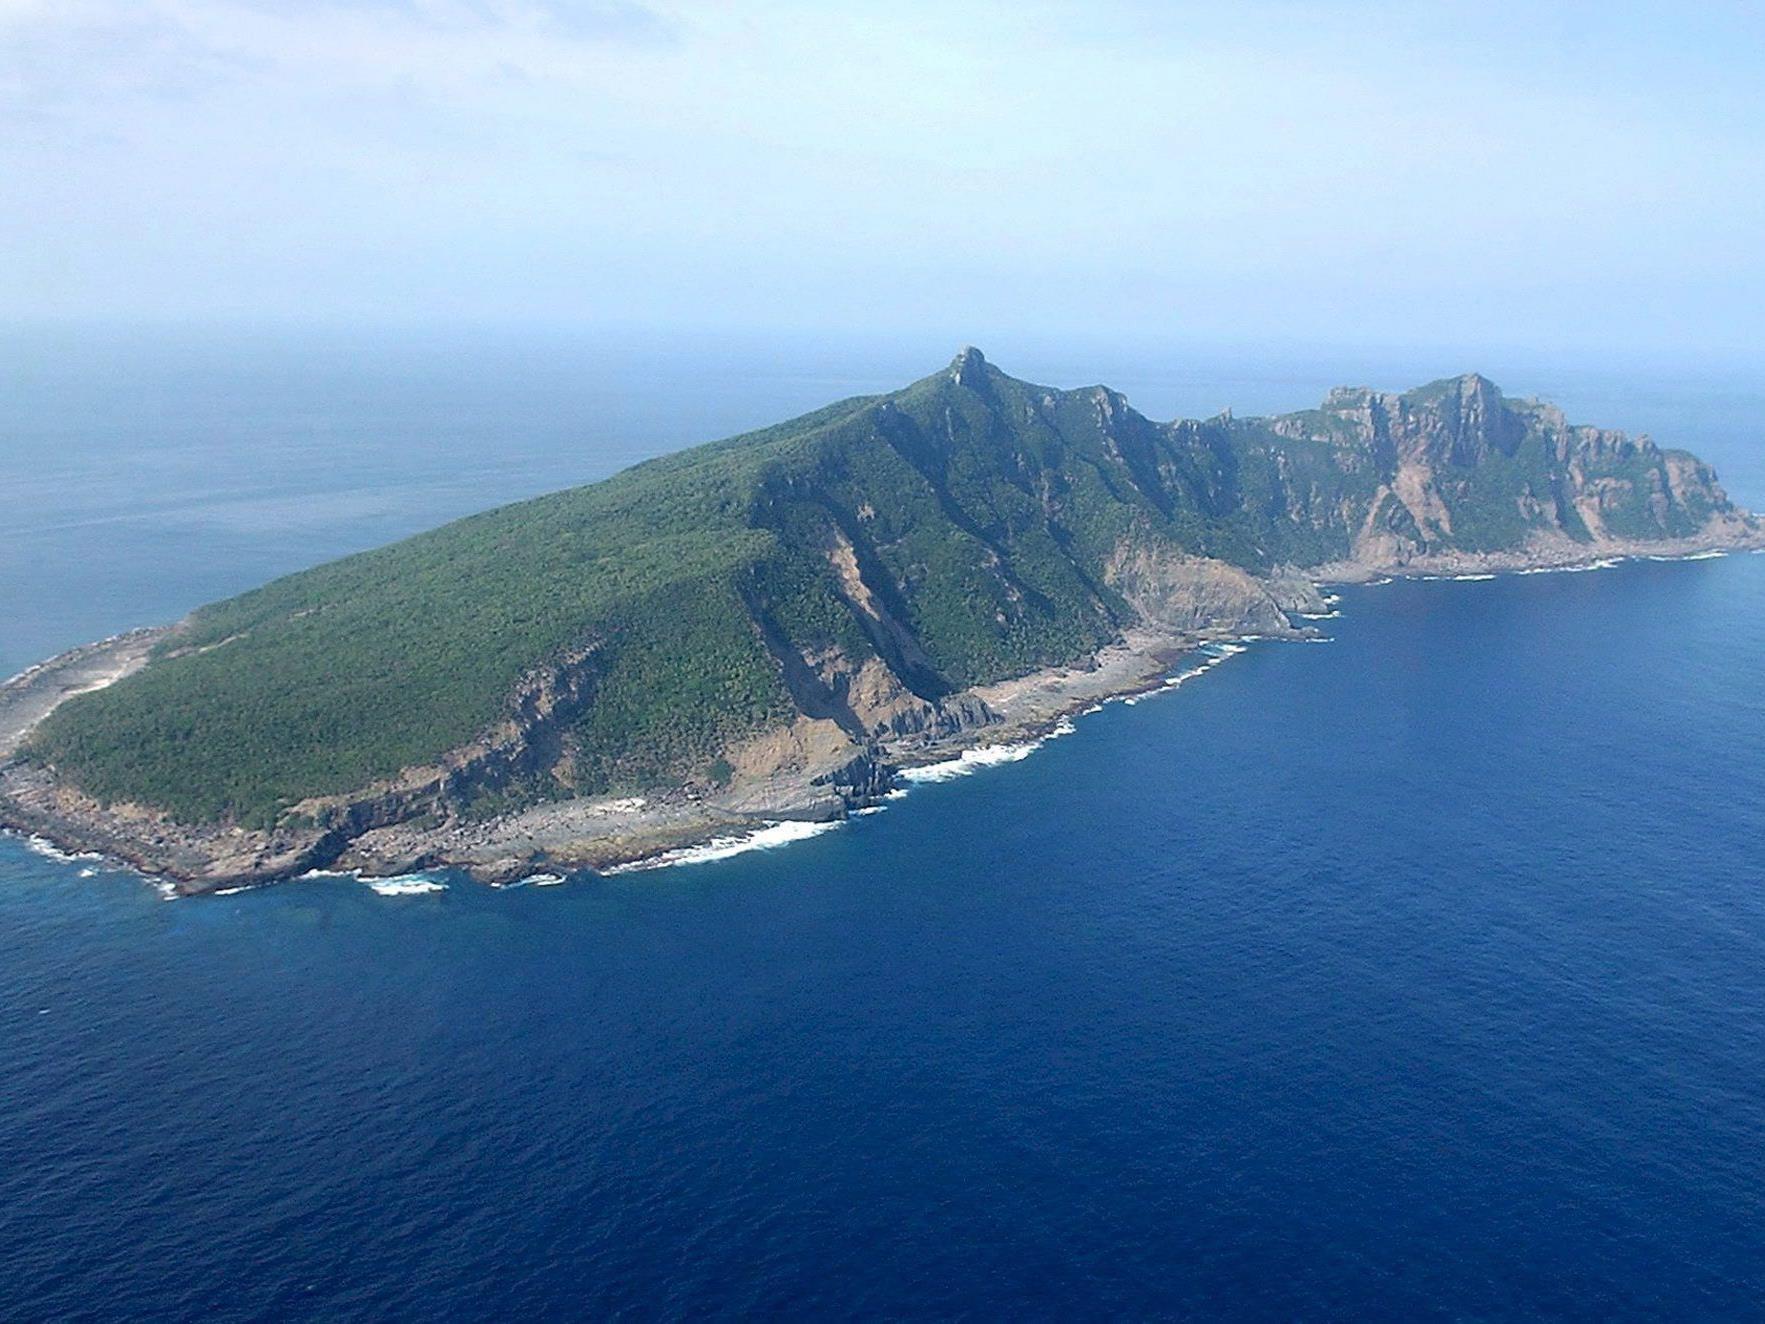 Eine Insel der Inselgruppe Sekaku (Japan) oder Diaoyu (China).